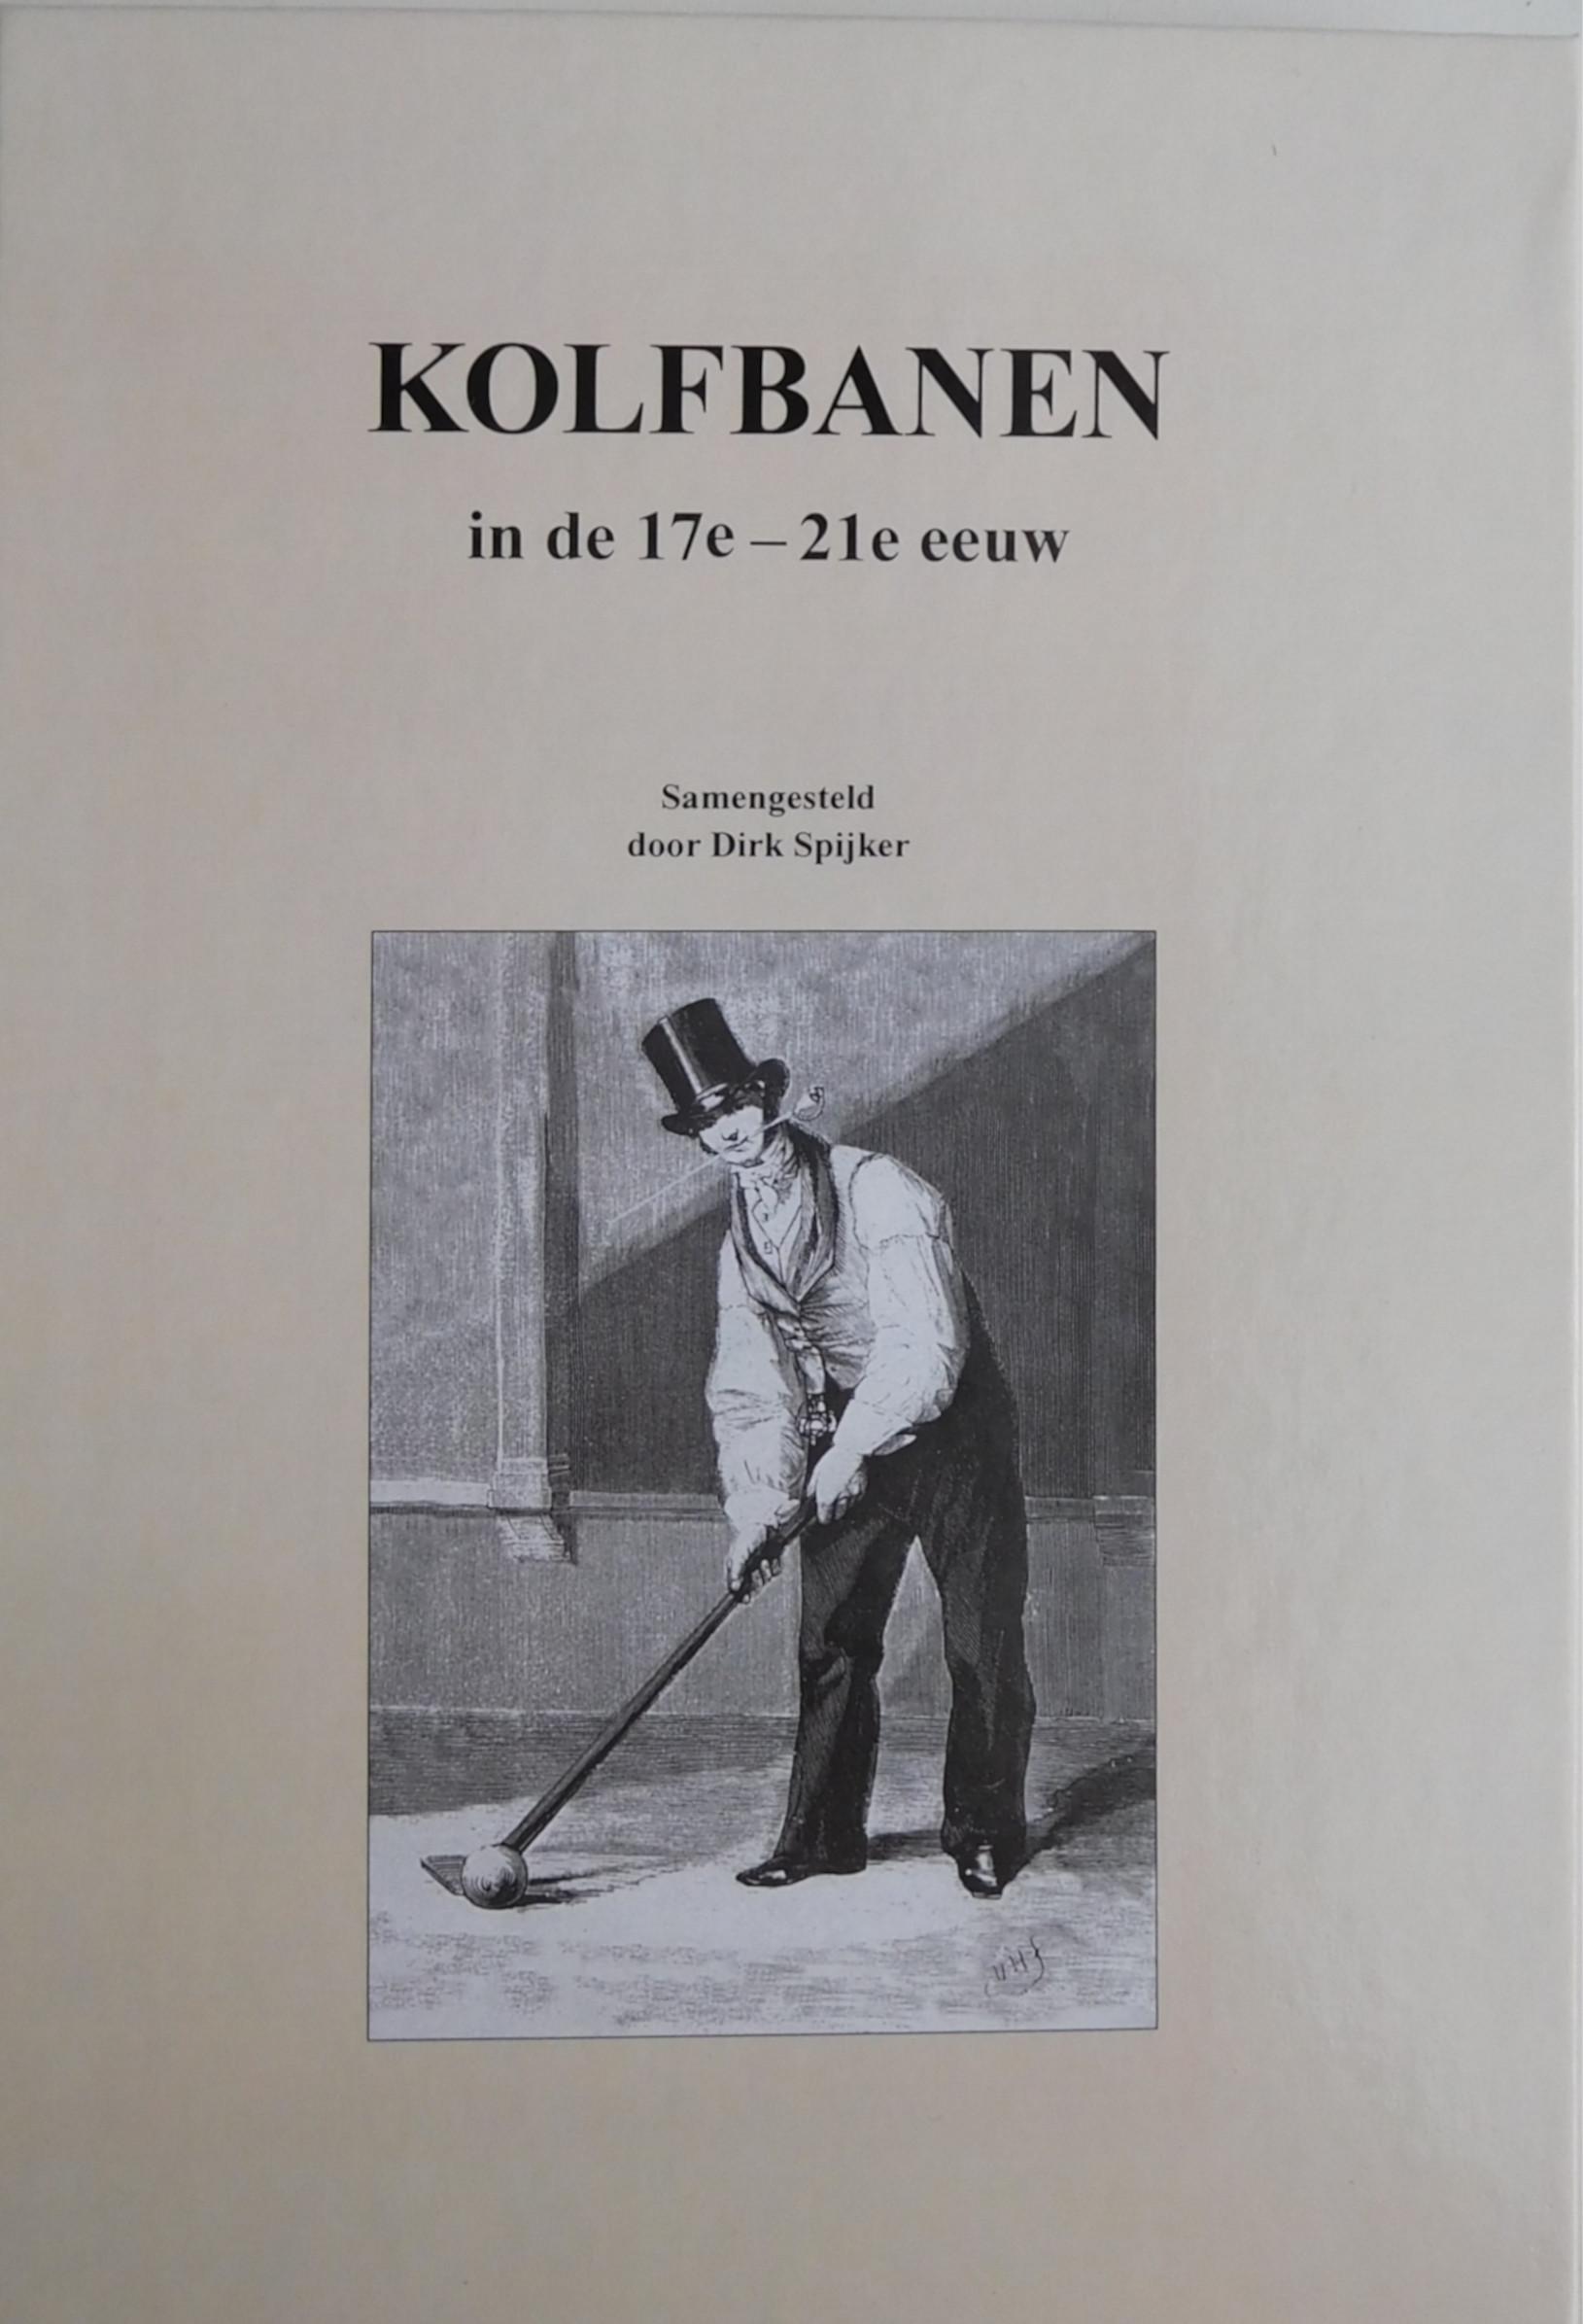 Dirk Spijker, Kolfbanen. 17e - 21e eeuw. 2020